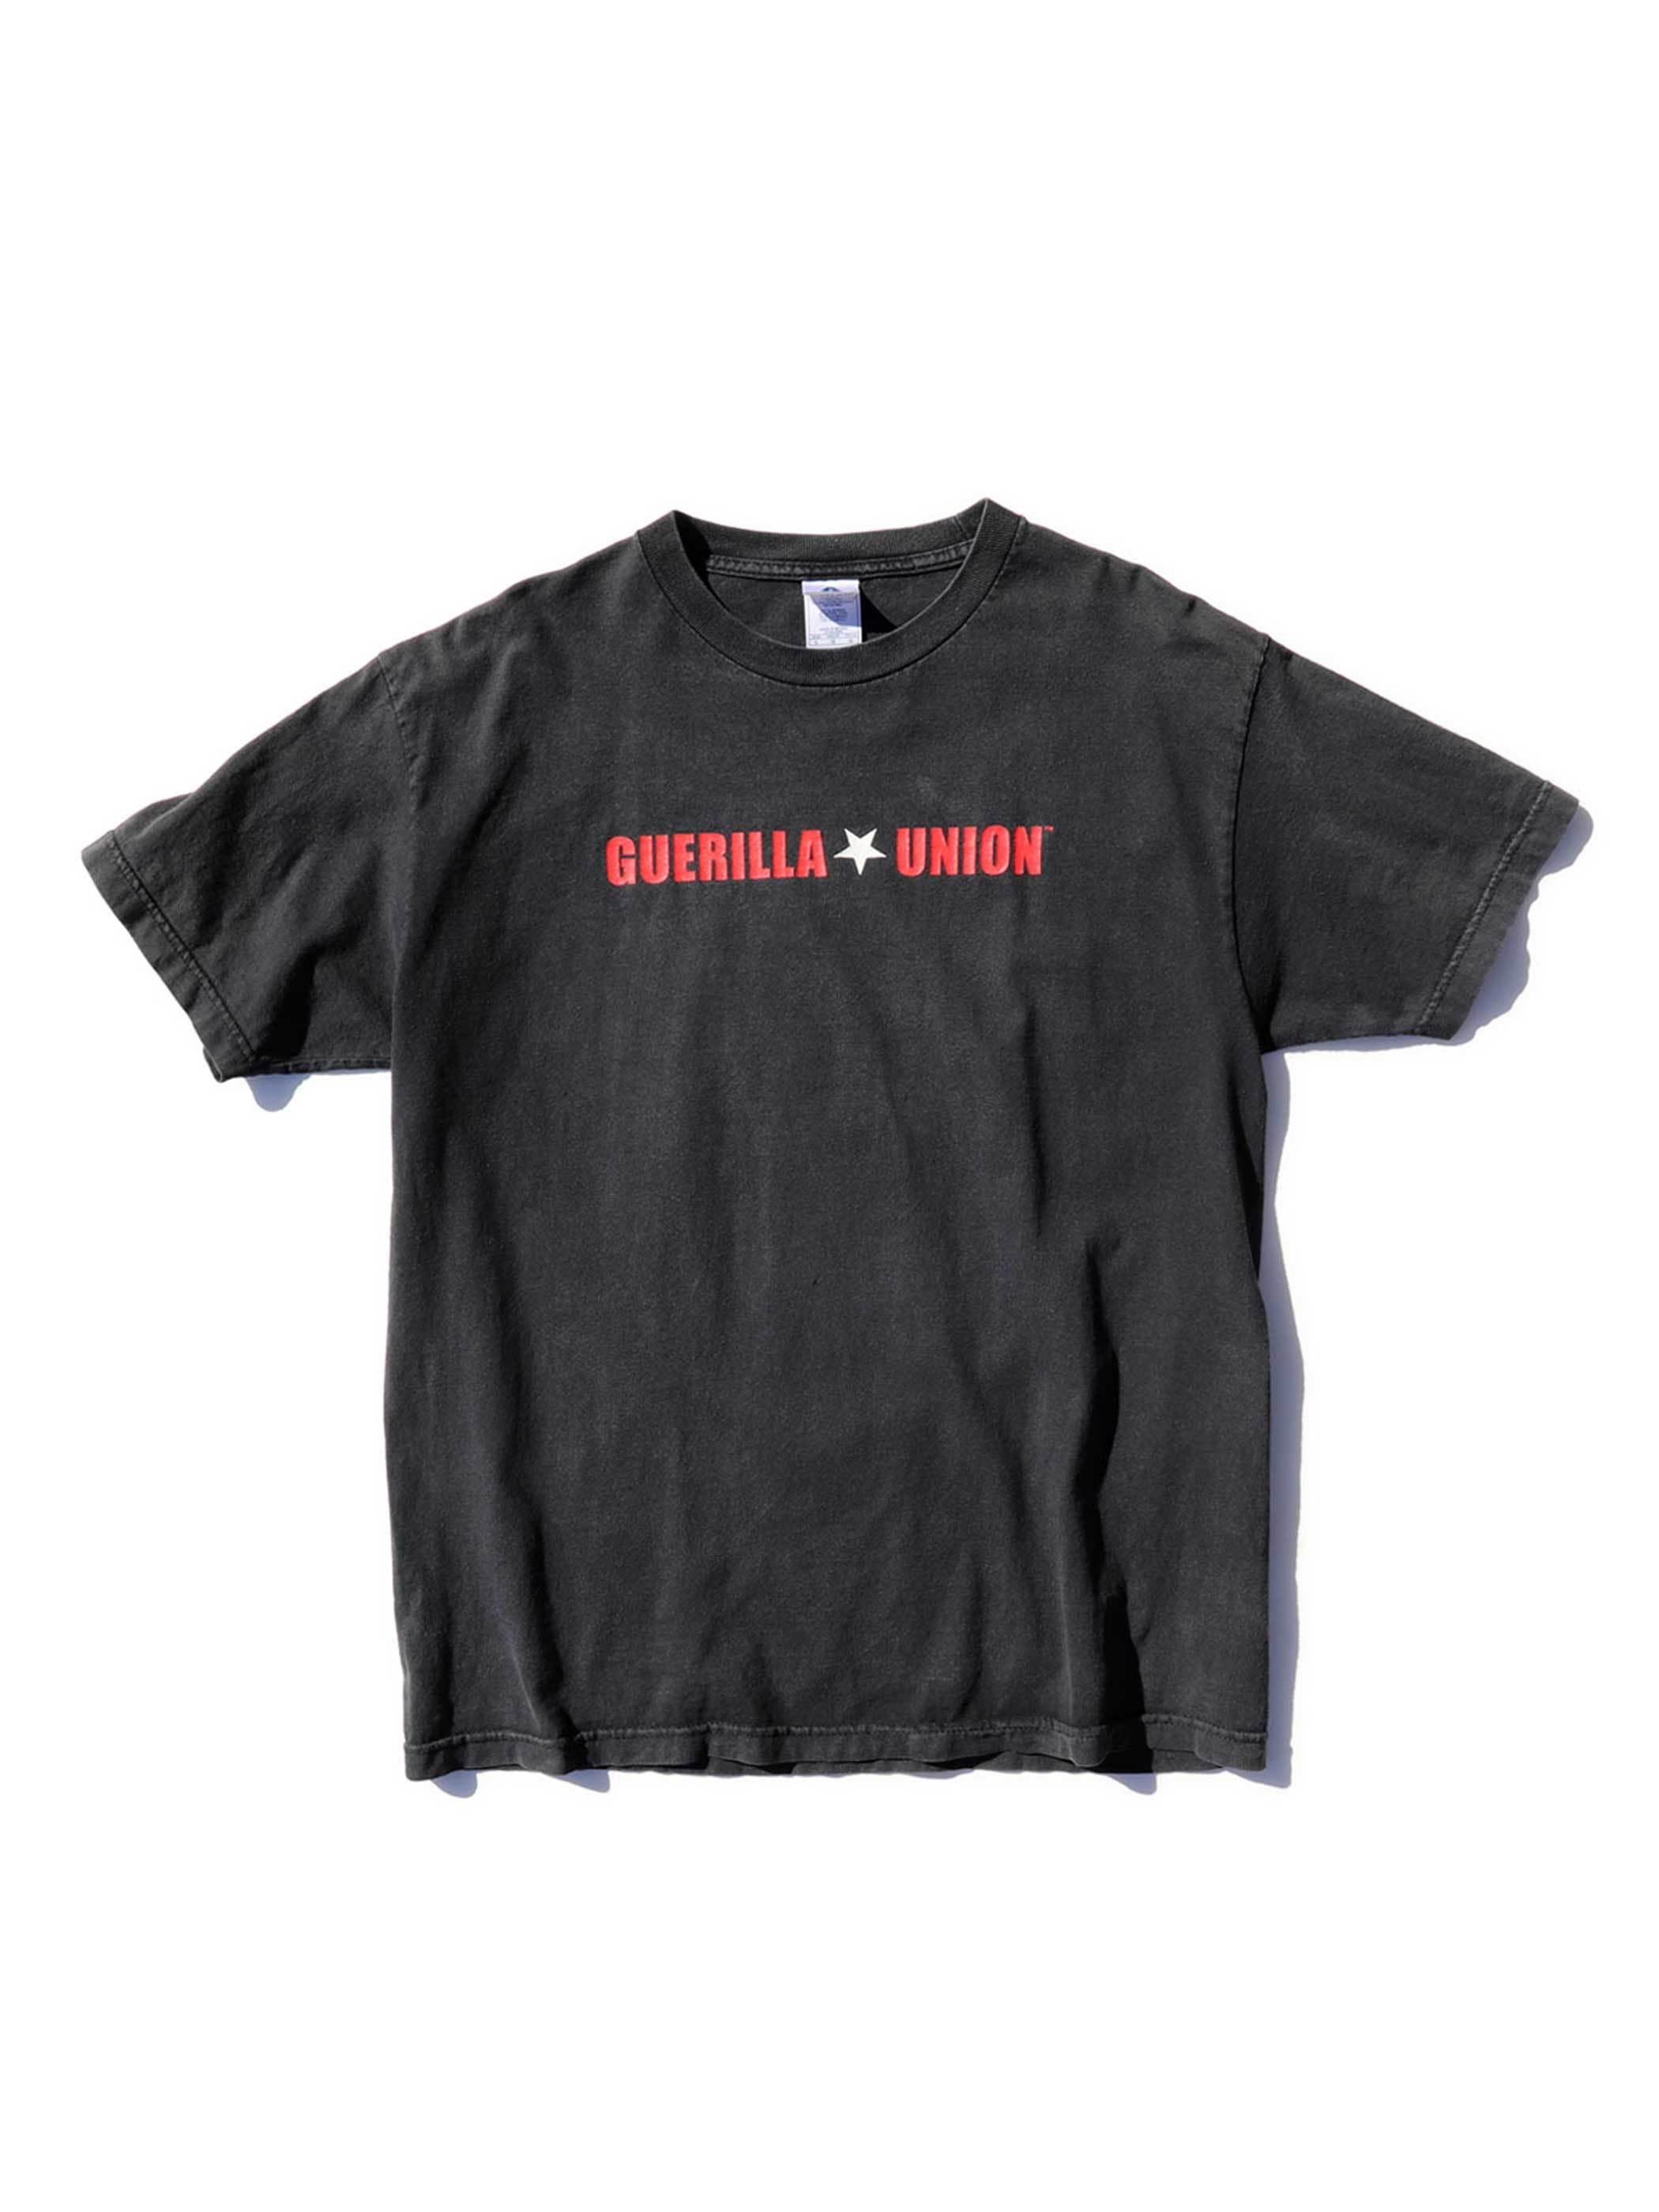 00's ROCK THE BELLS 2006 WORLD TOUR プリントTシャツ [L]